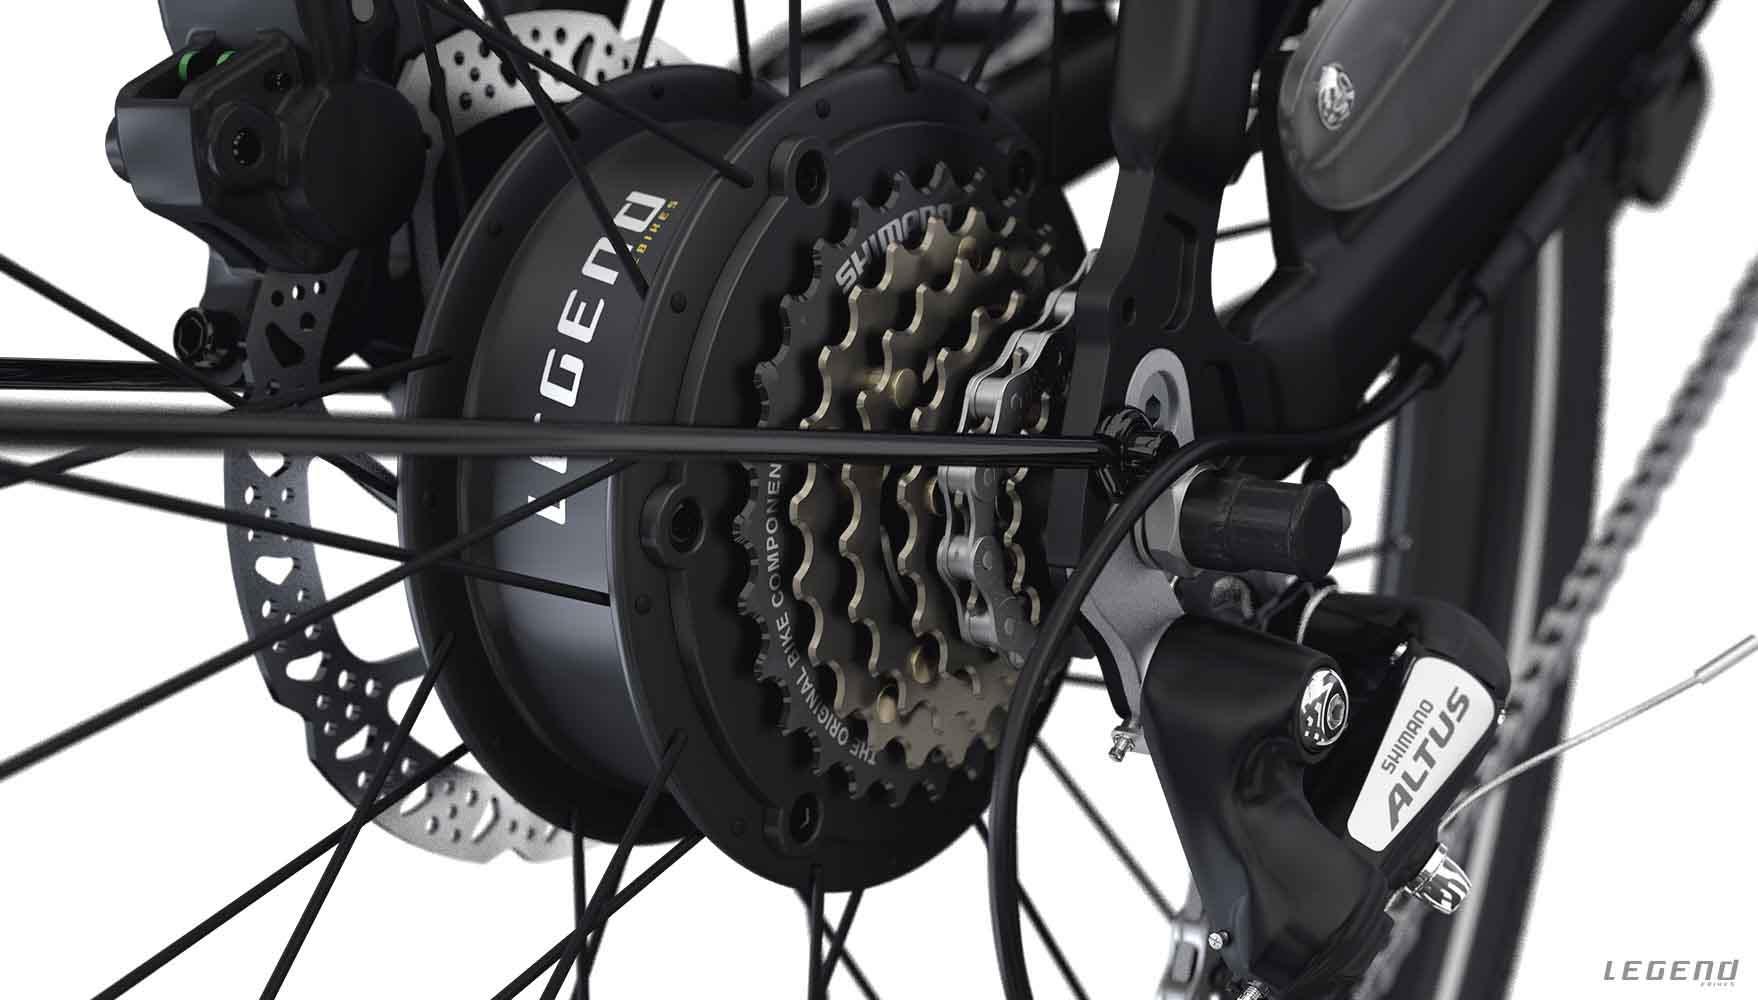 motor bicicleta rueda trasera